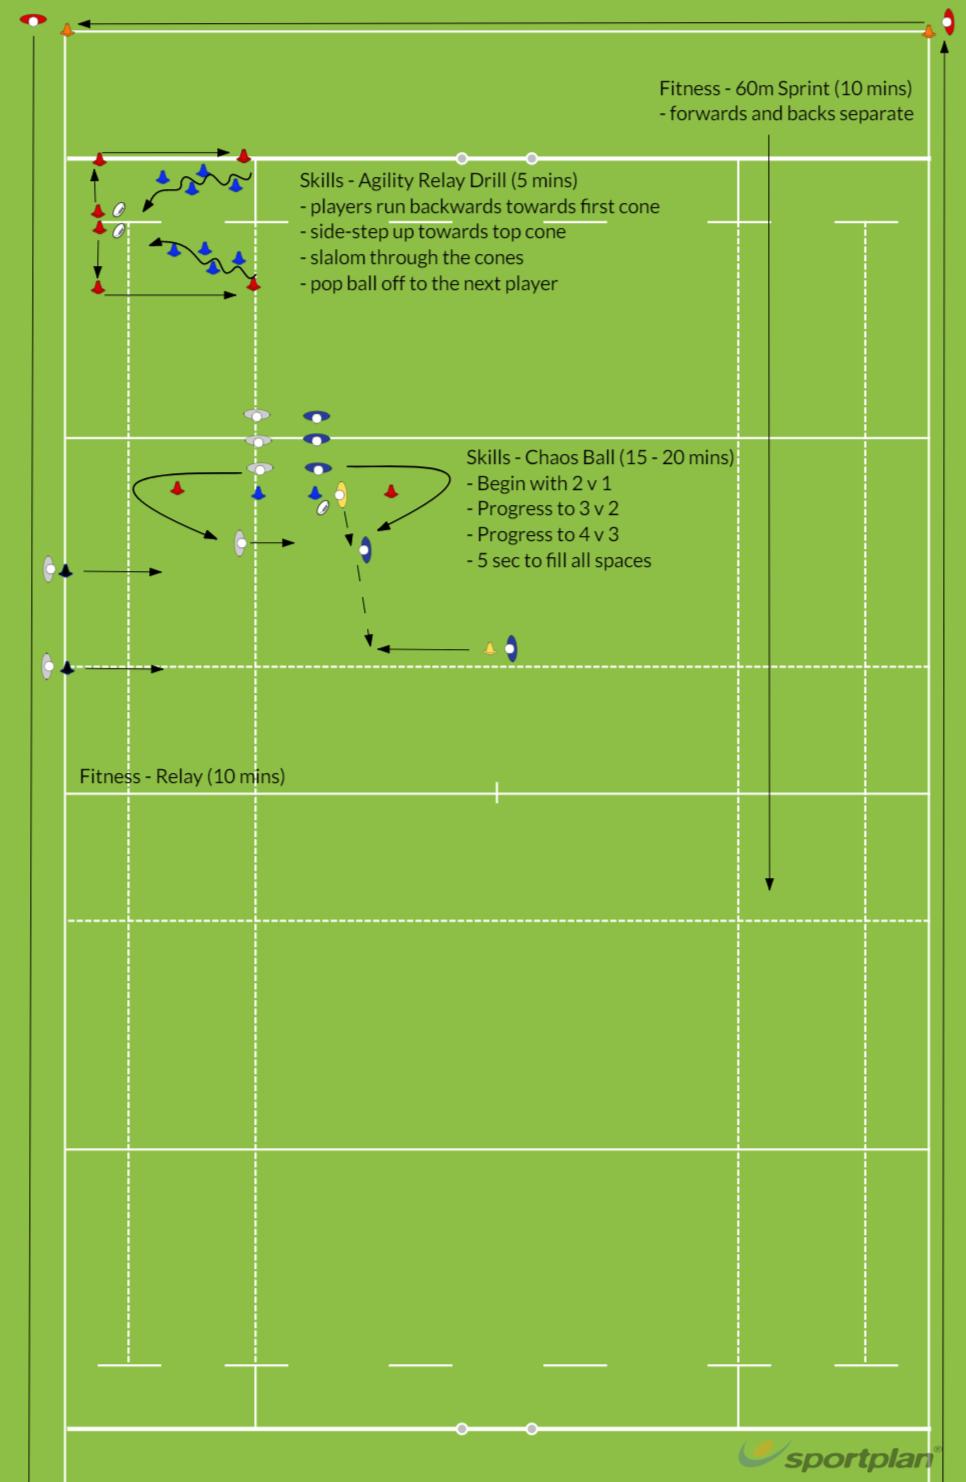 01/08/17 - Agility, 2 v 1 & 3 v 2Rugby Drills Coaching